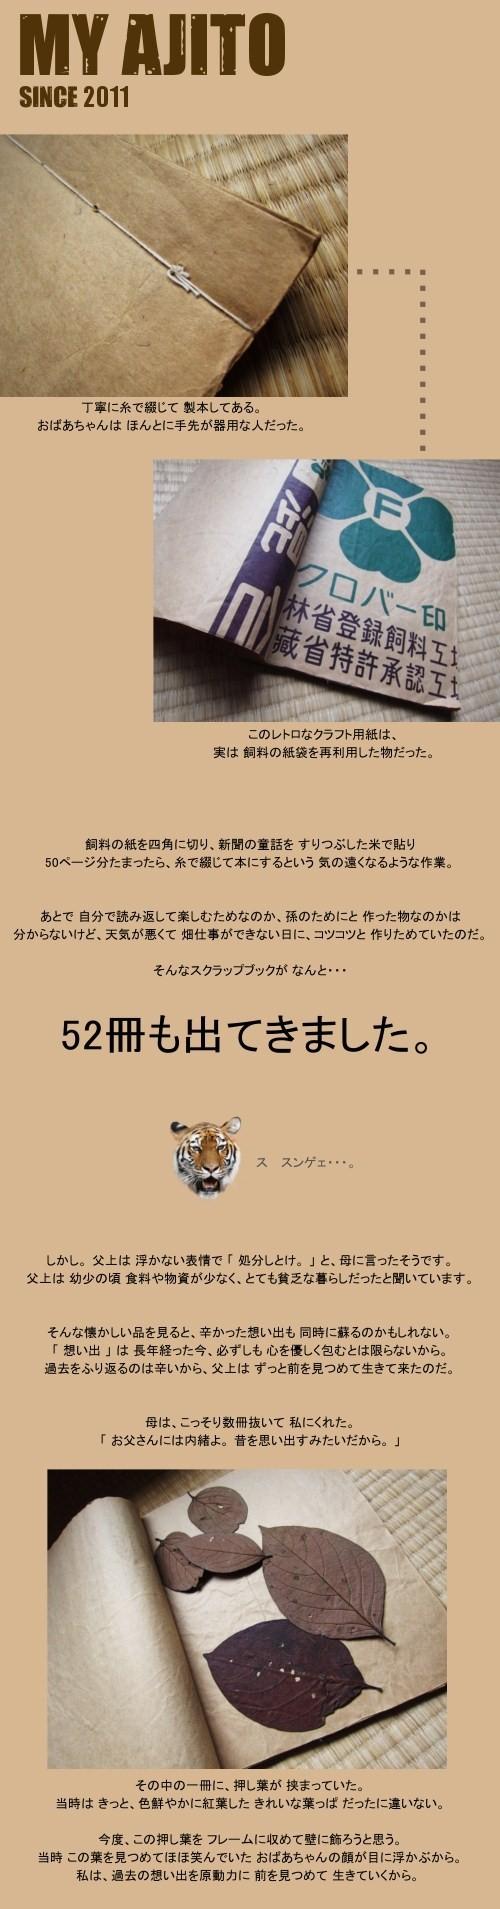 oshiba_05.jpg